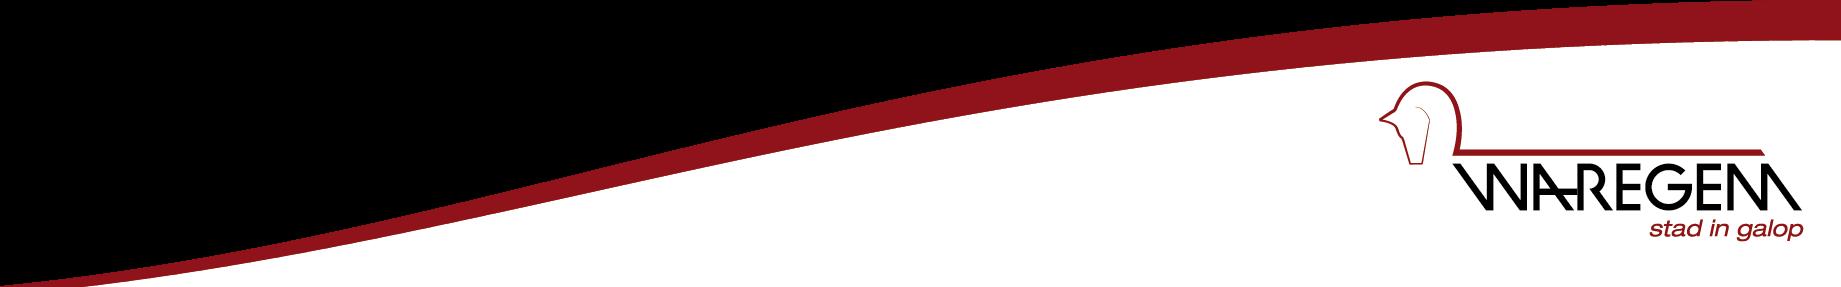 logo Stad Waregem